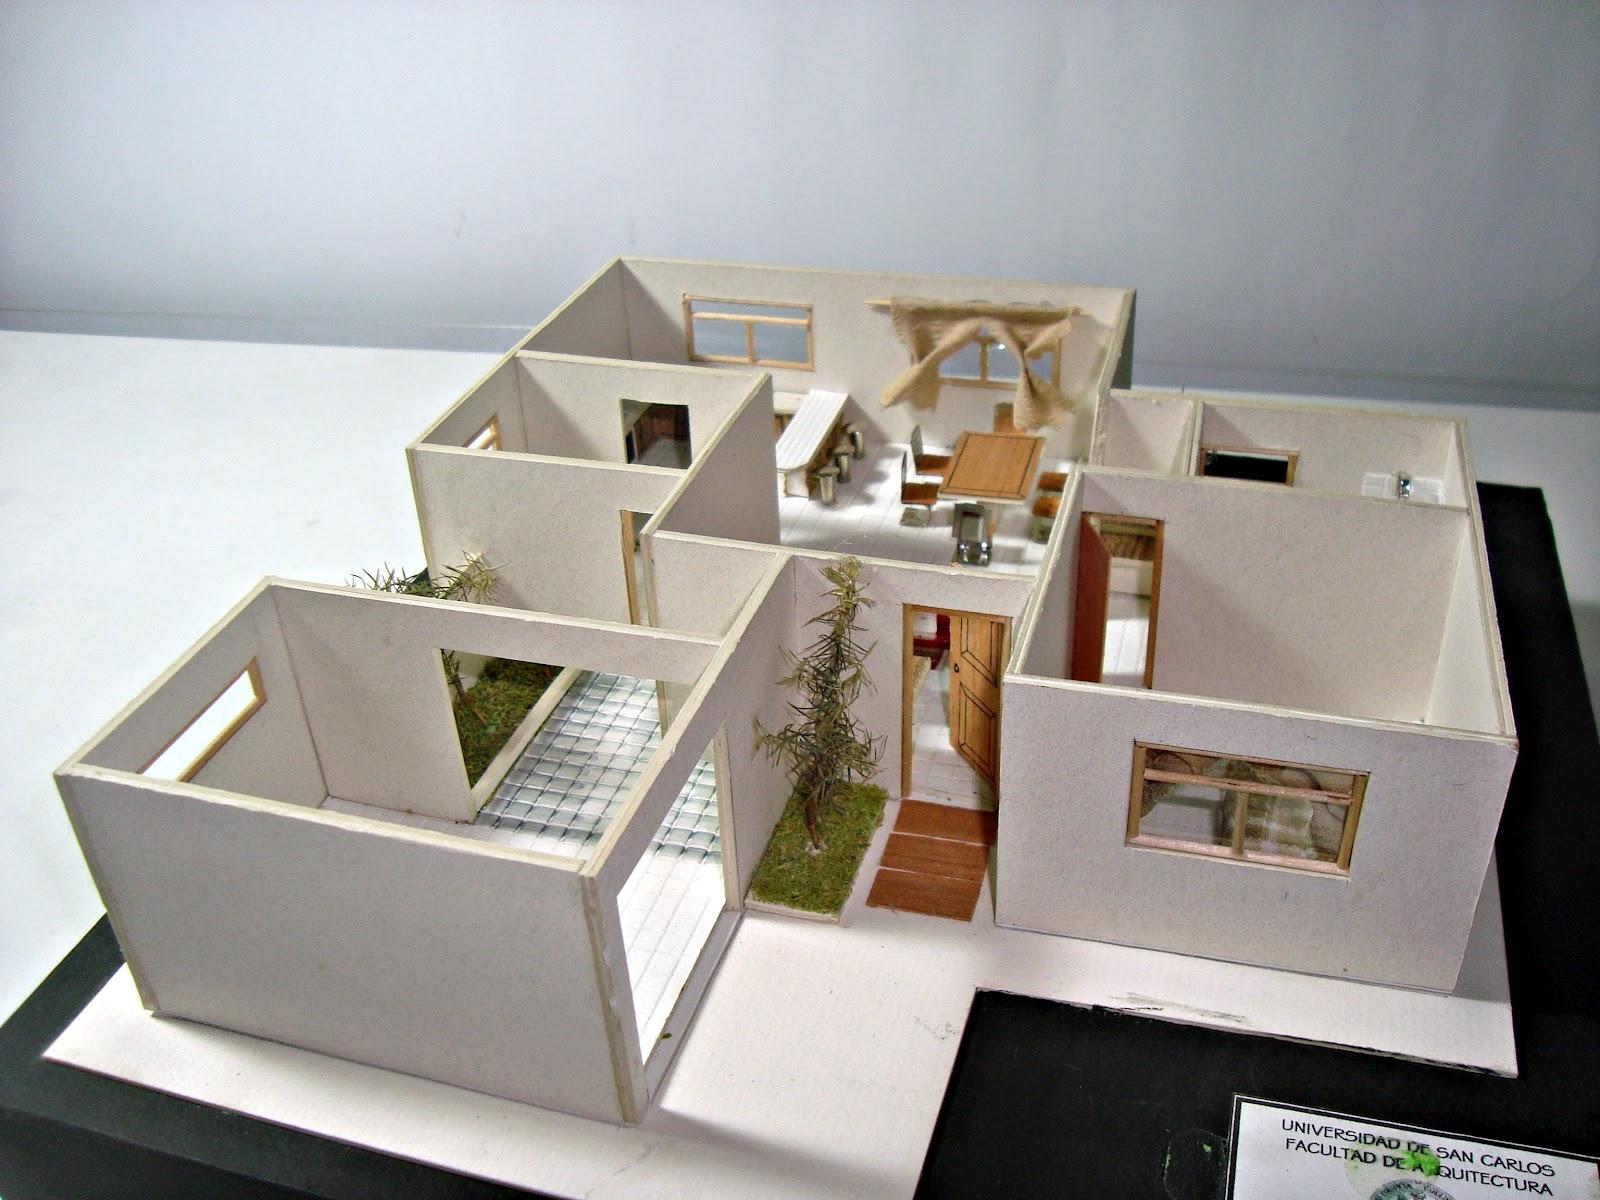 Portafolio Dise O Arquitect Nico Modelos Arquitectonicos 1